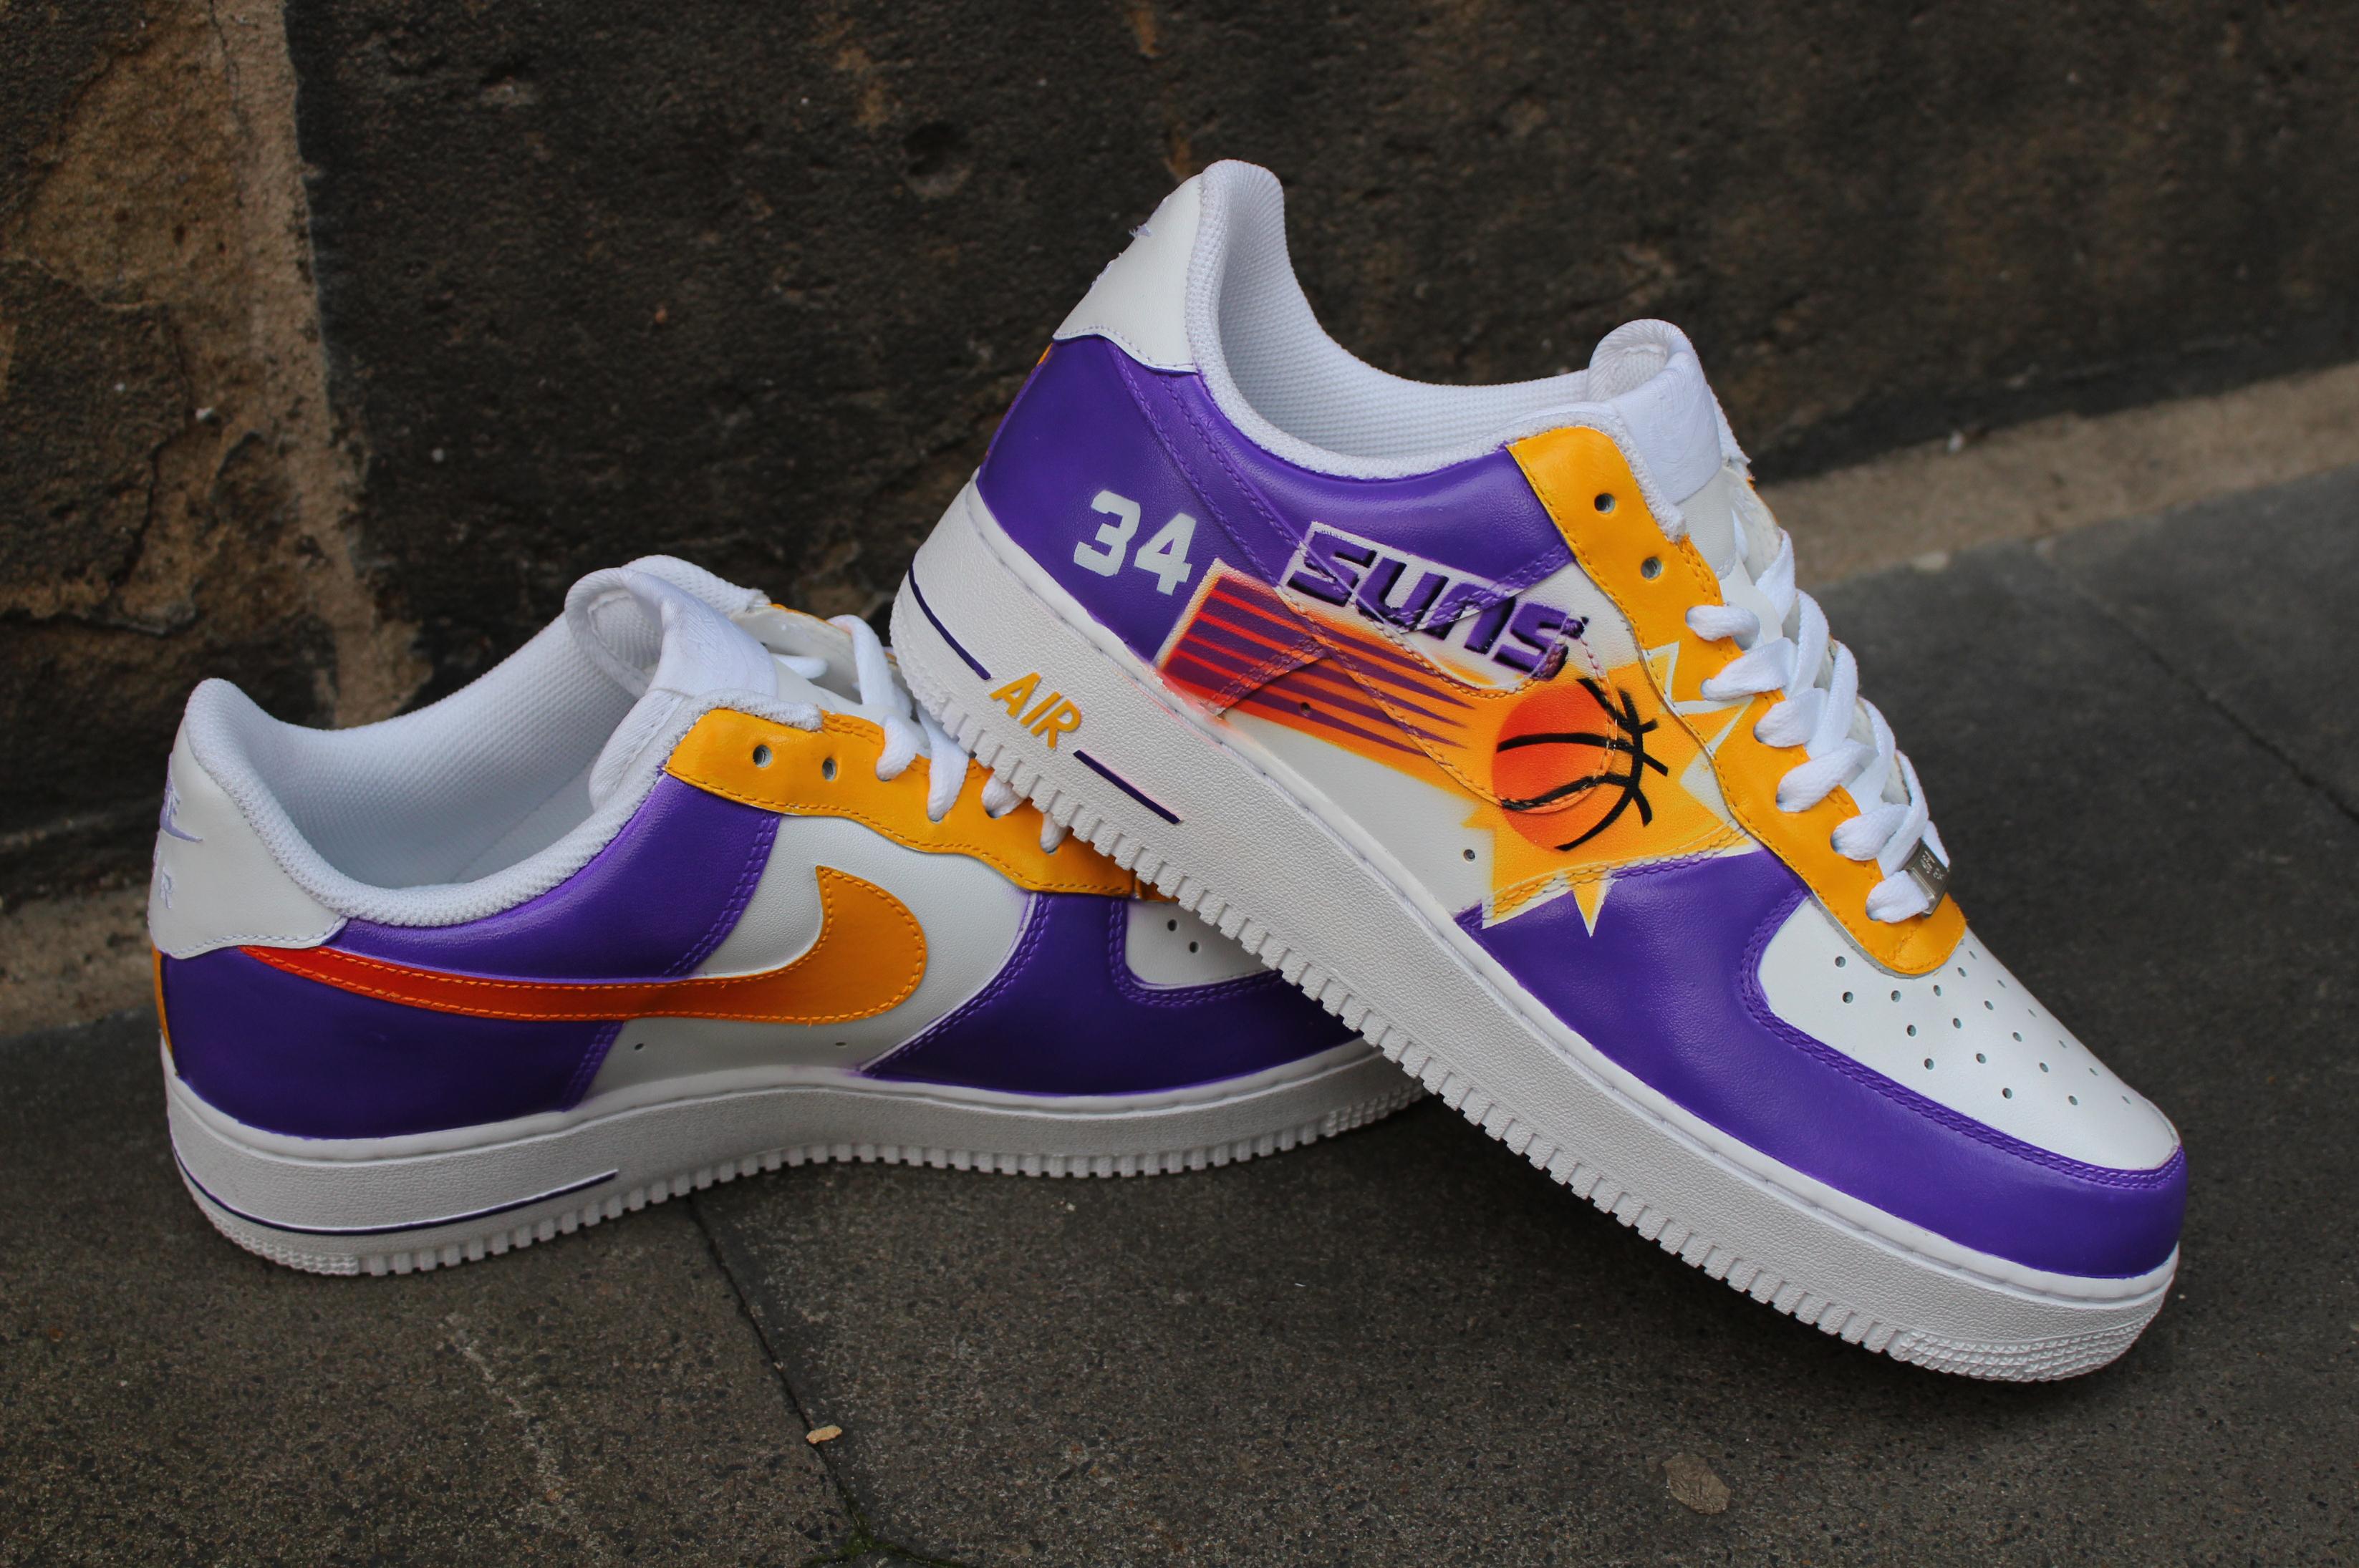 Schuhe dac